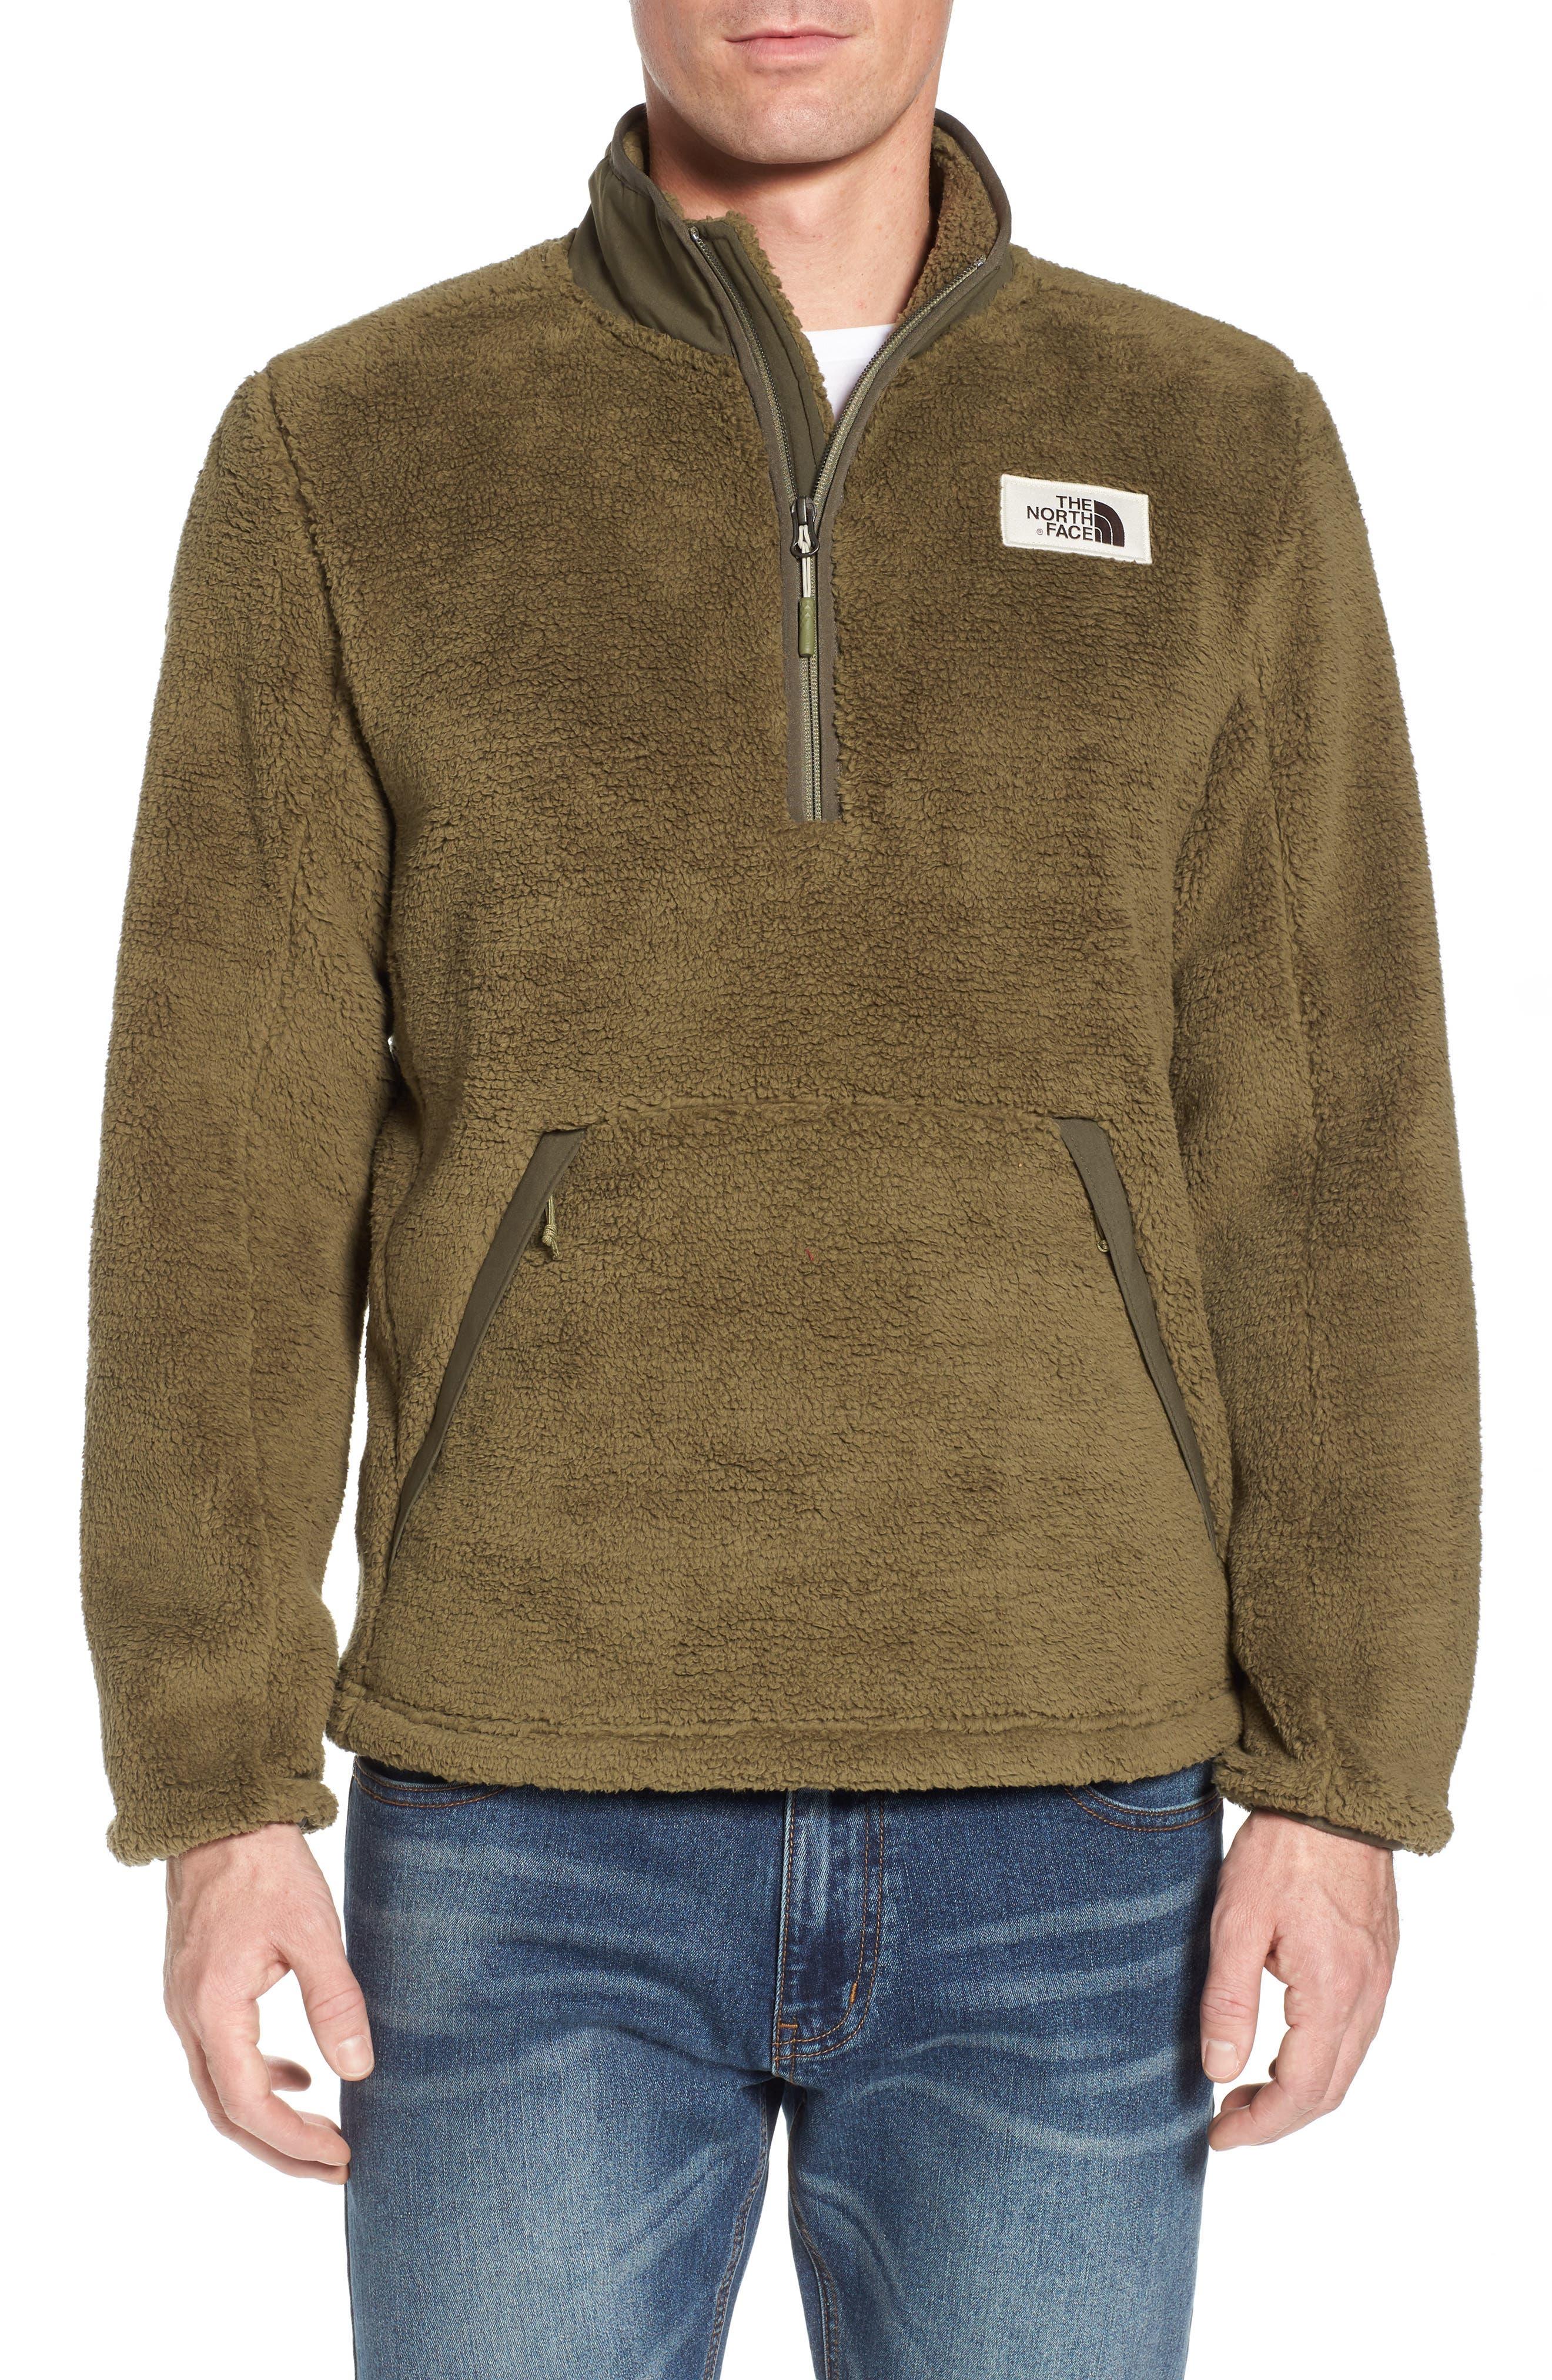 Khampfire Fleece Pullover,                             Main thumbnail 1, color,                             301